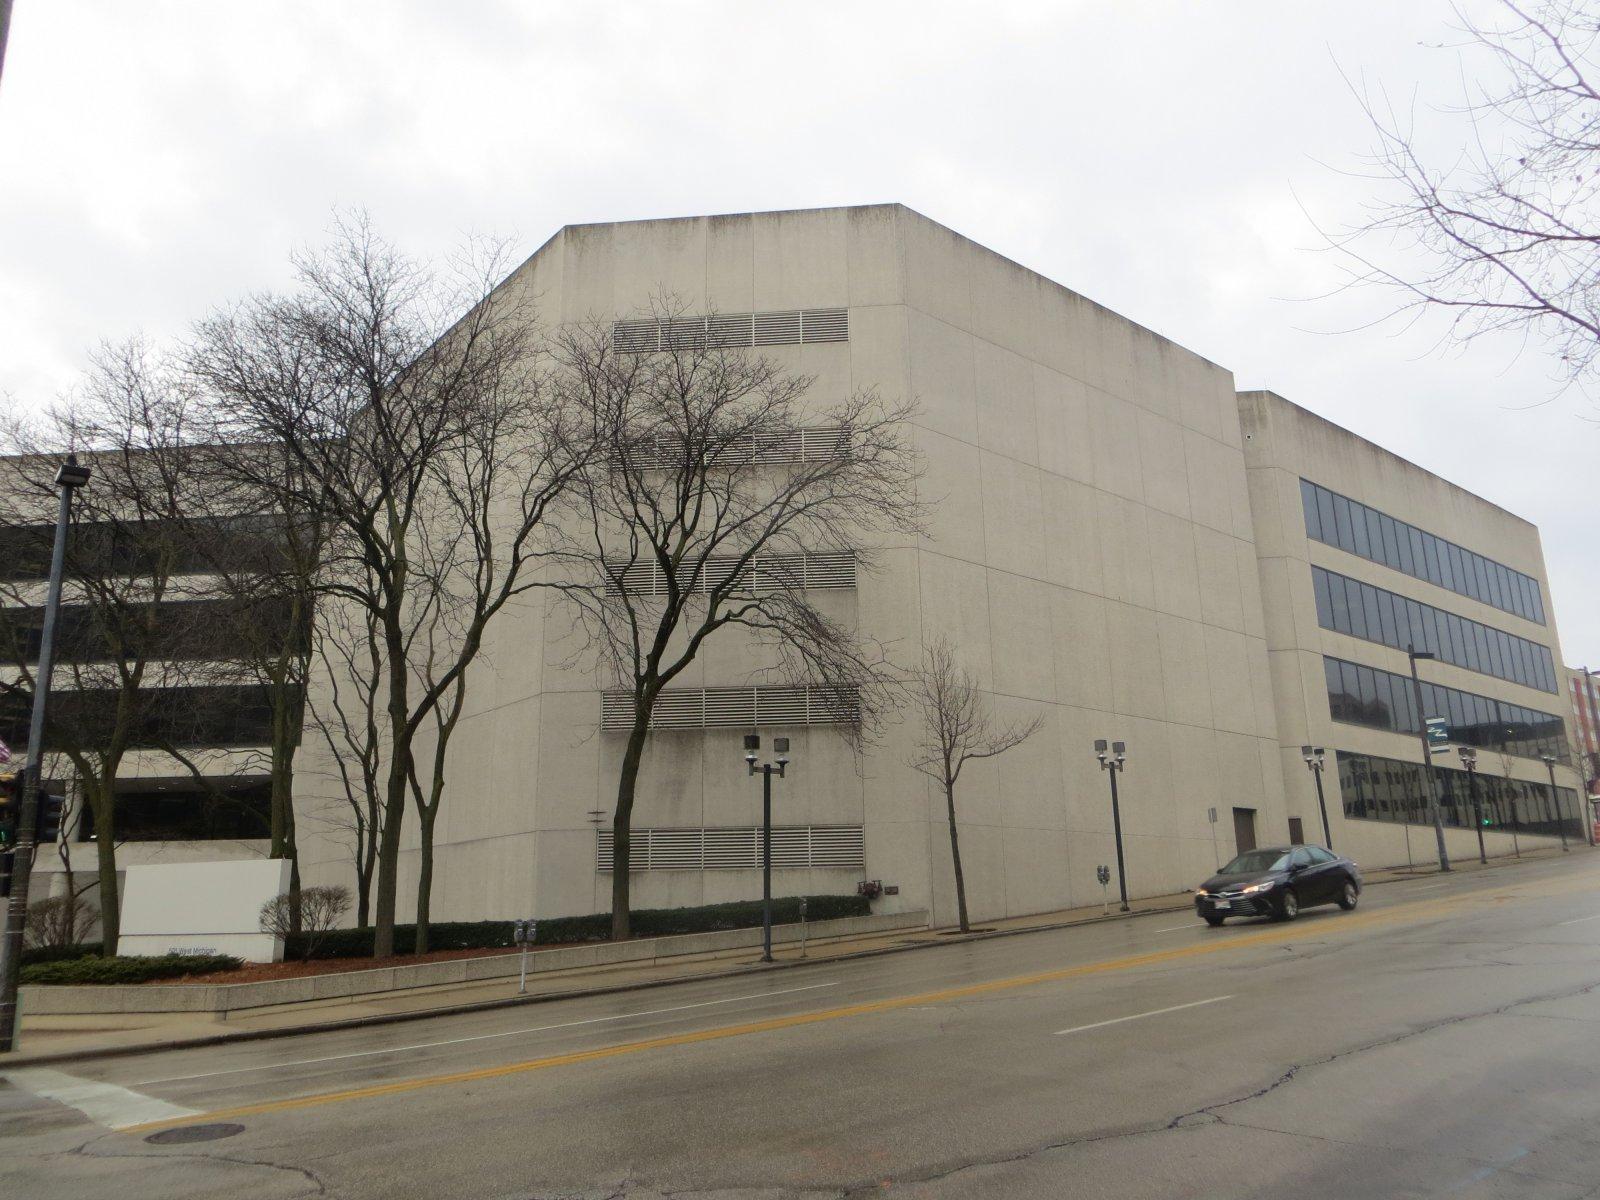 501 W. Michigan St.